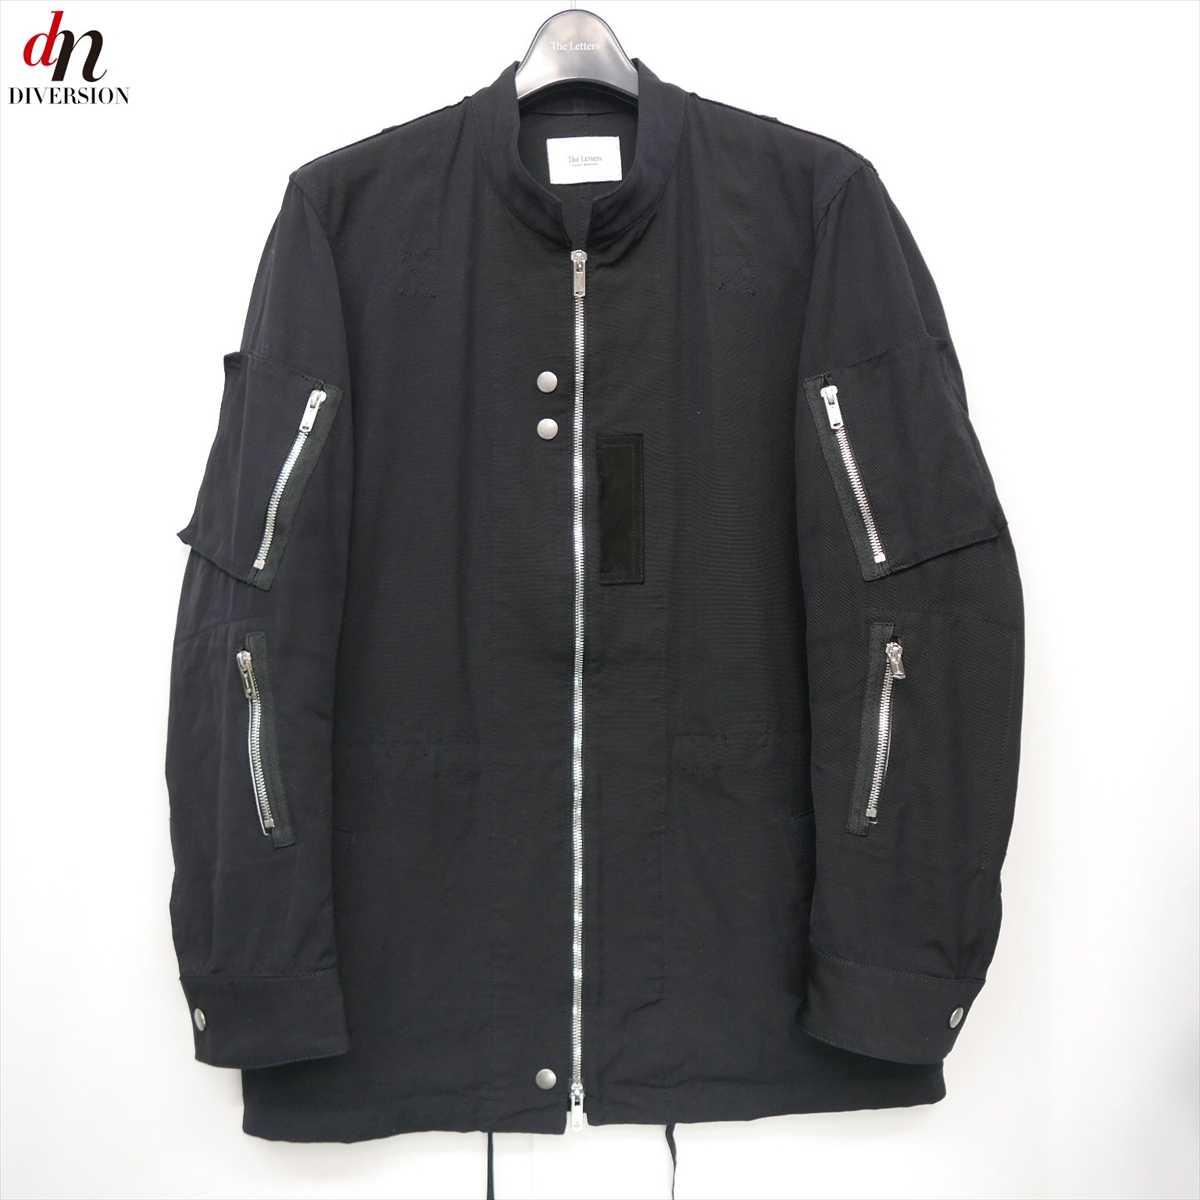 18SS The Letters ザ レターズ Military Zip Jacket. -Pin OX- ナイロン コットン ミリタリー ジップ ジャケット ブルゾン BLACK S 【中古】 DNS-7201